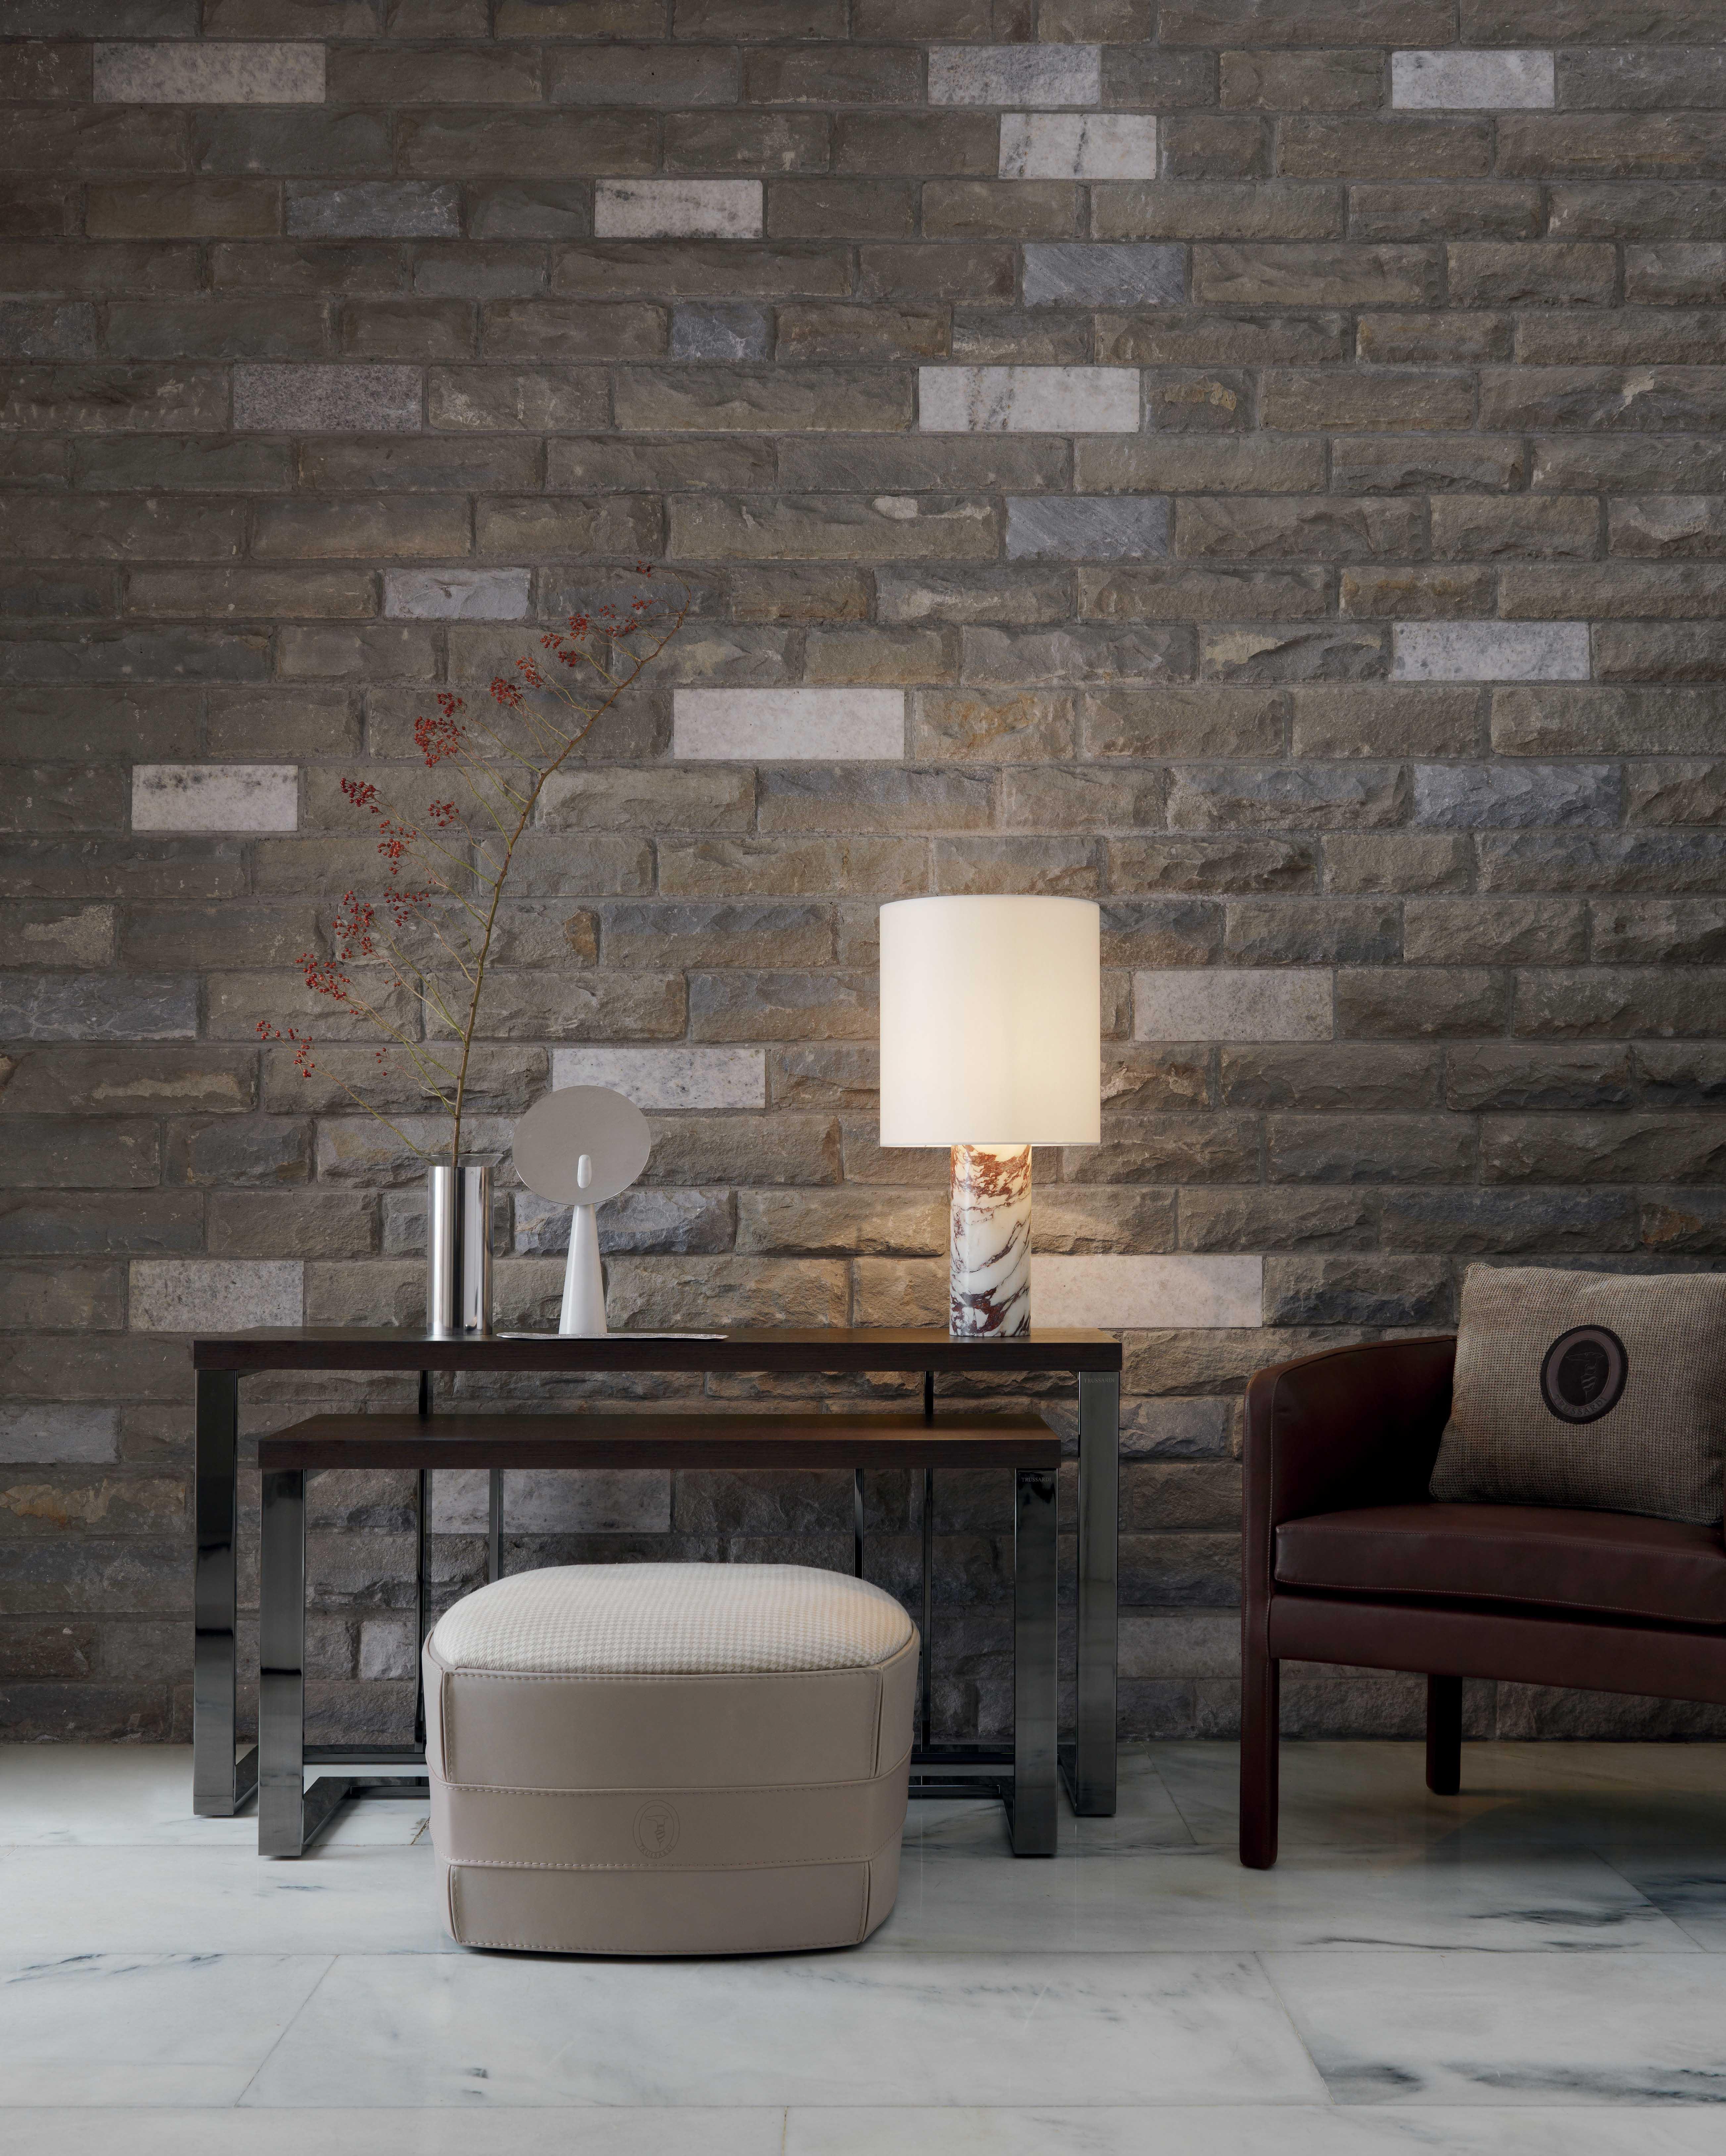 tr_tecno_consoles_maggy_armchair_pouf_414_ottoman_stone_table_lamp